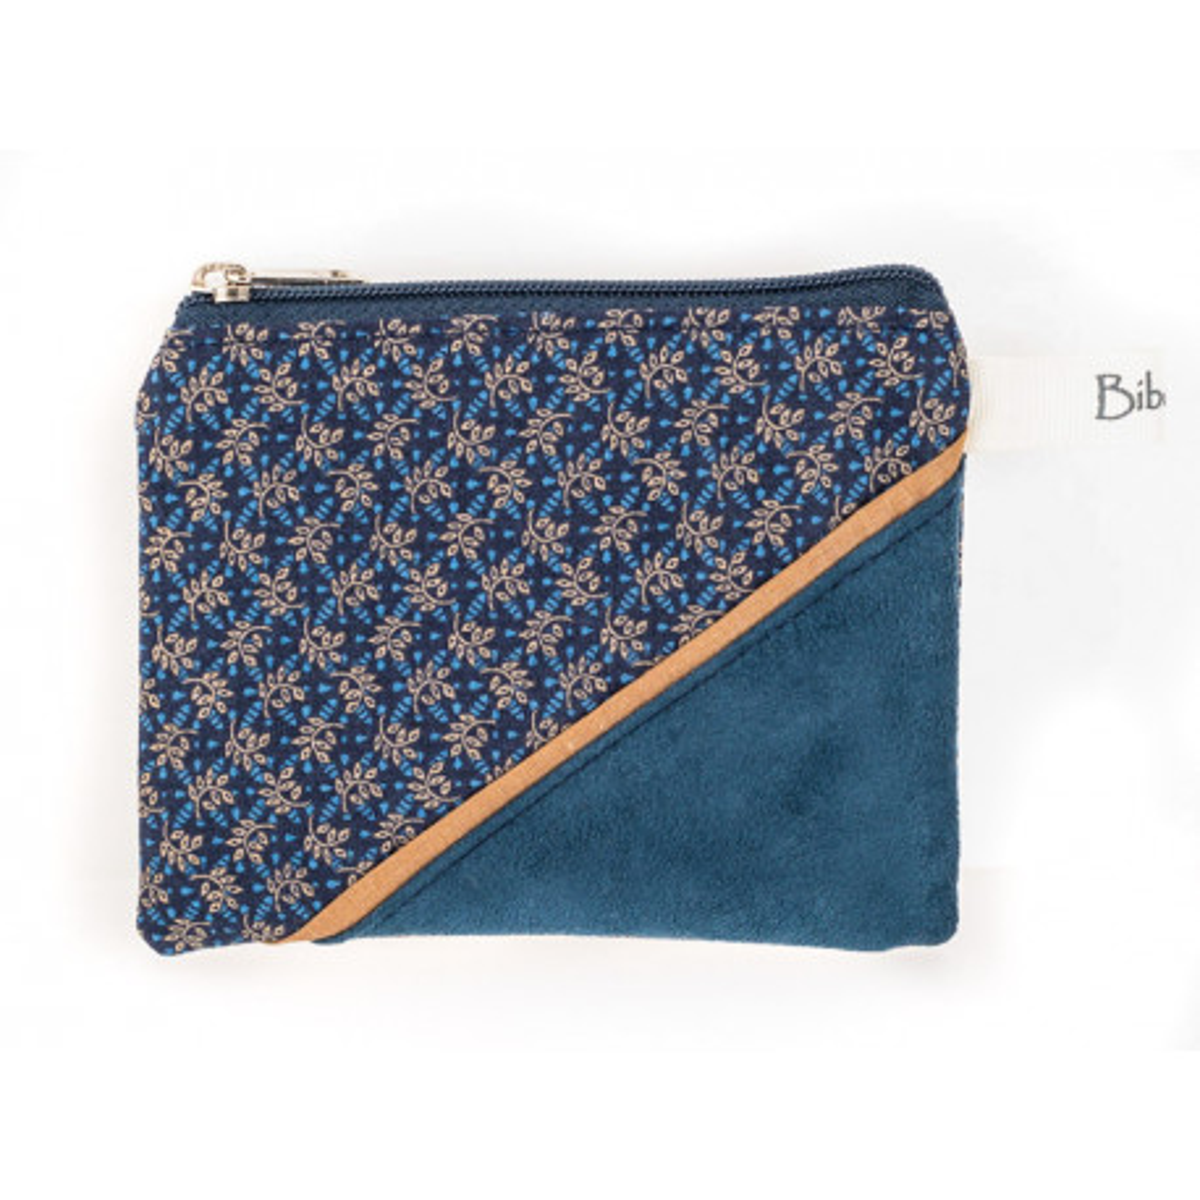 Petit porte-monnaie zippé bleu